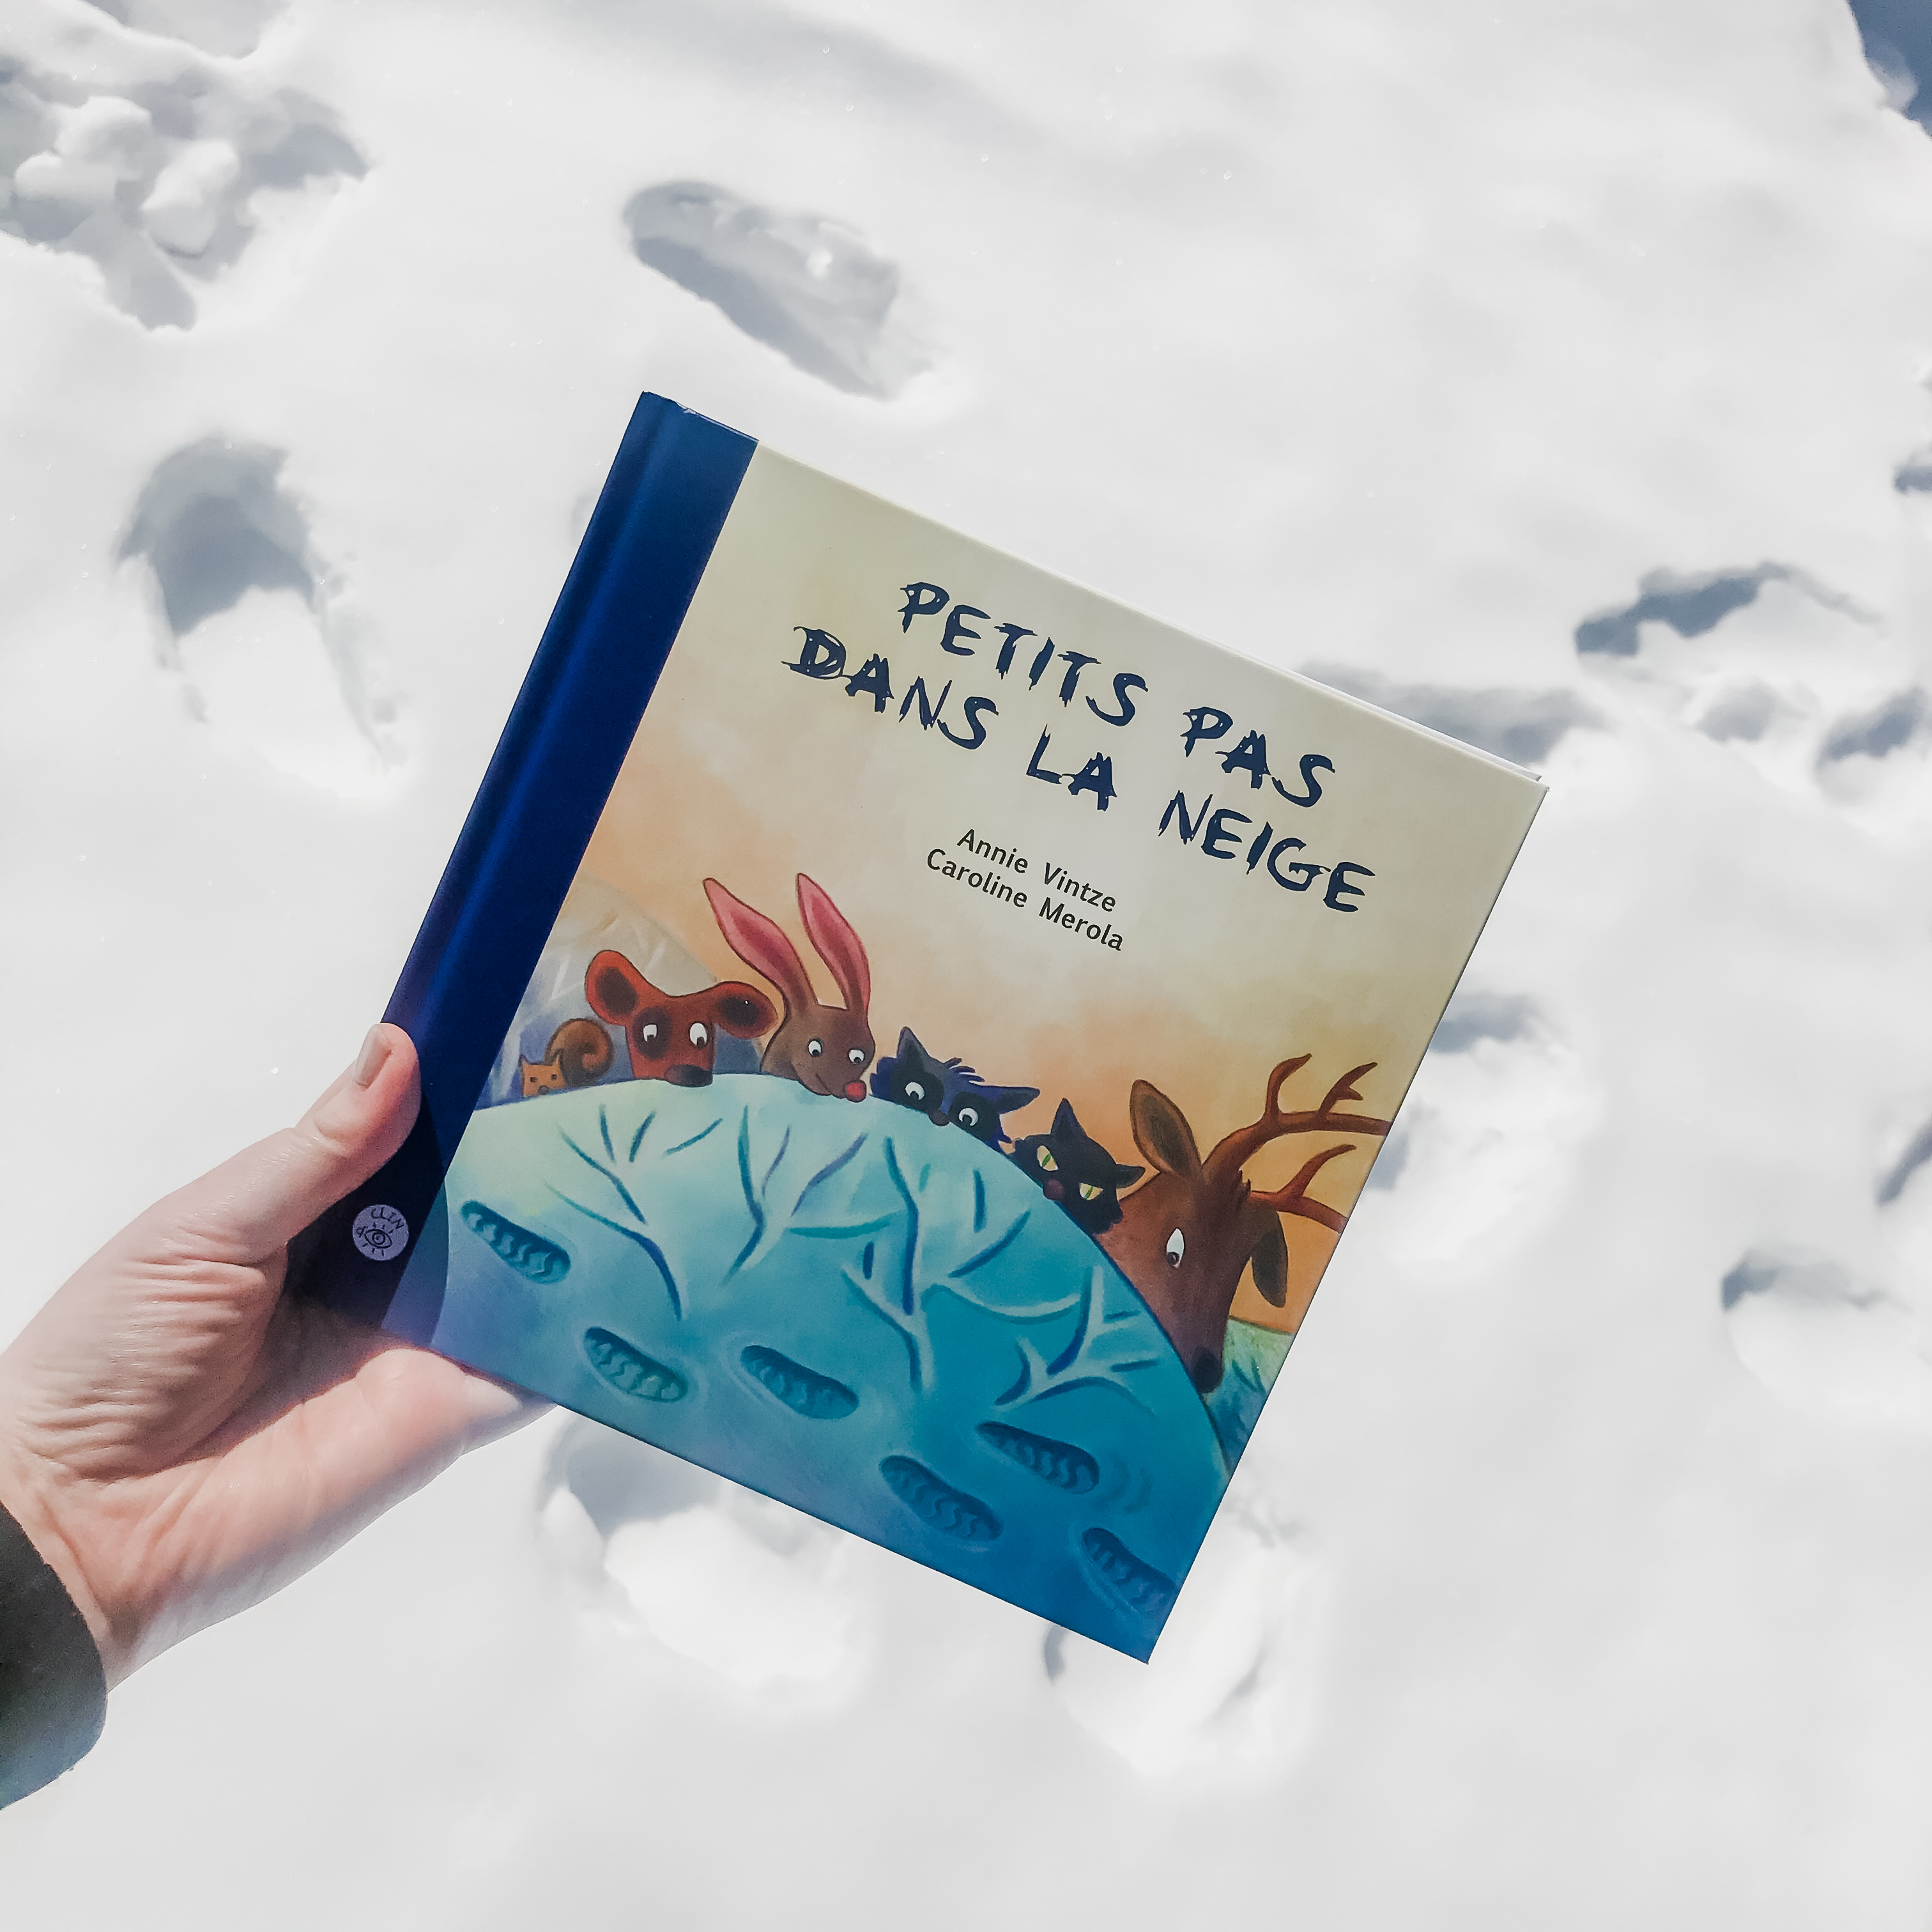 Petits pas dans la neige (Isatis)